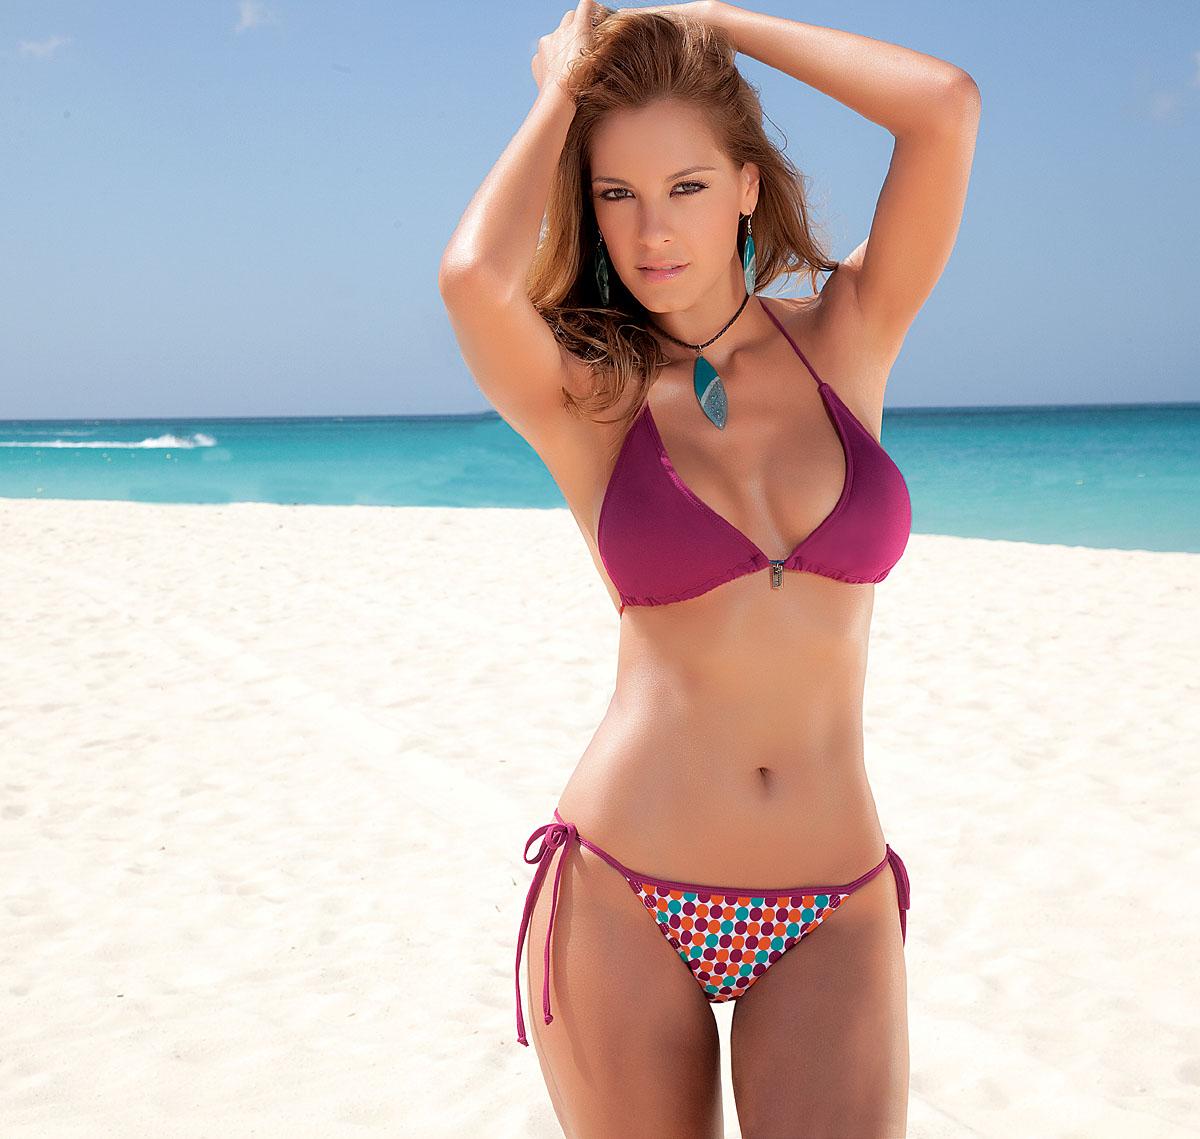 Company Profiles Images Bikini Teens 33